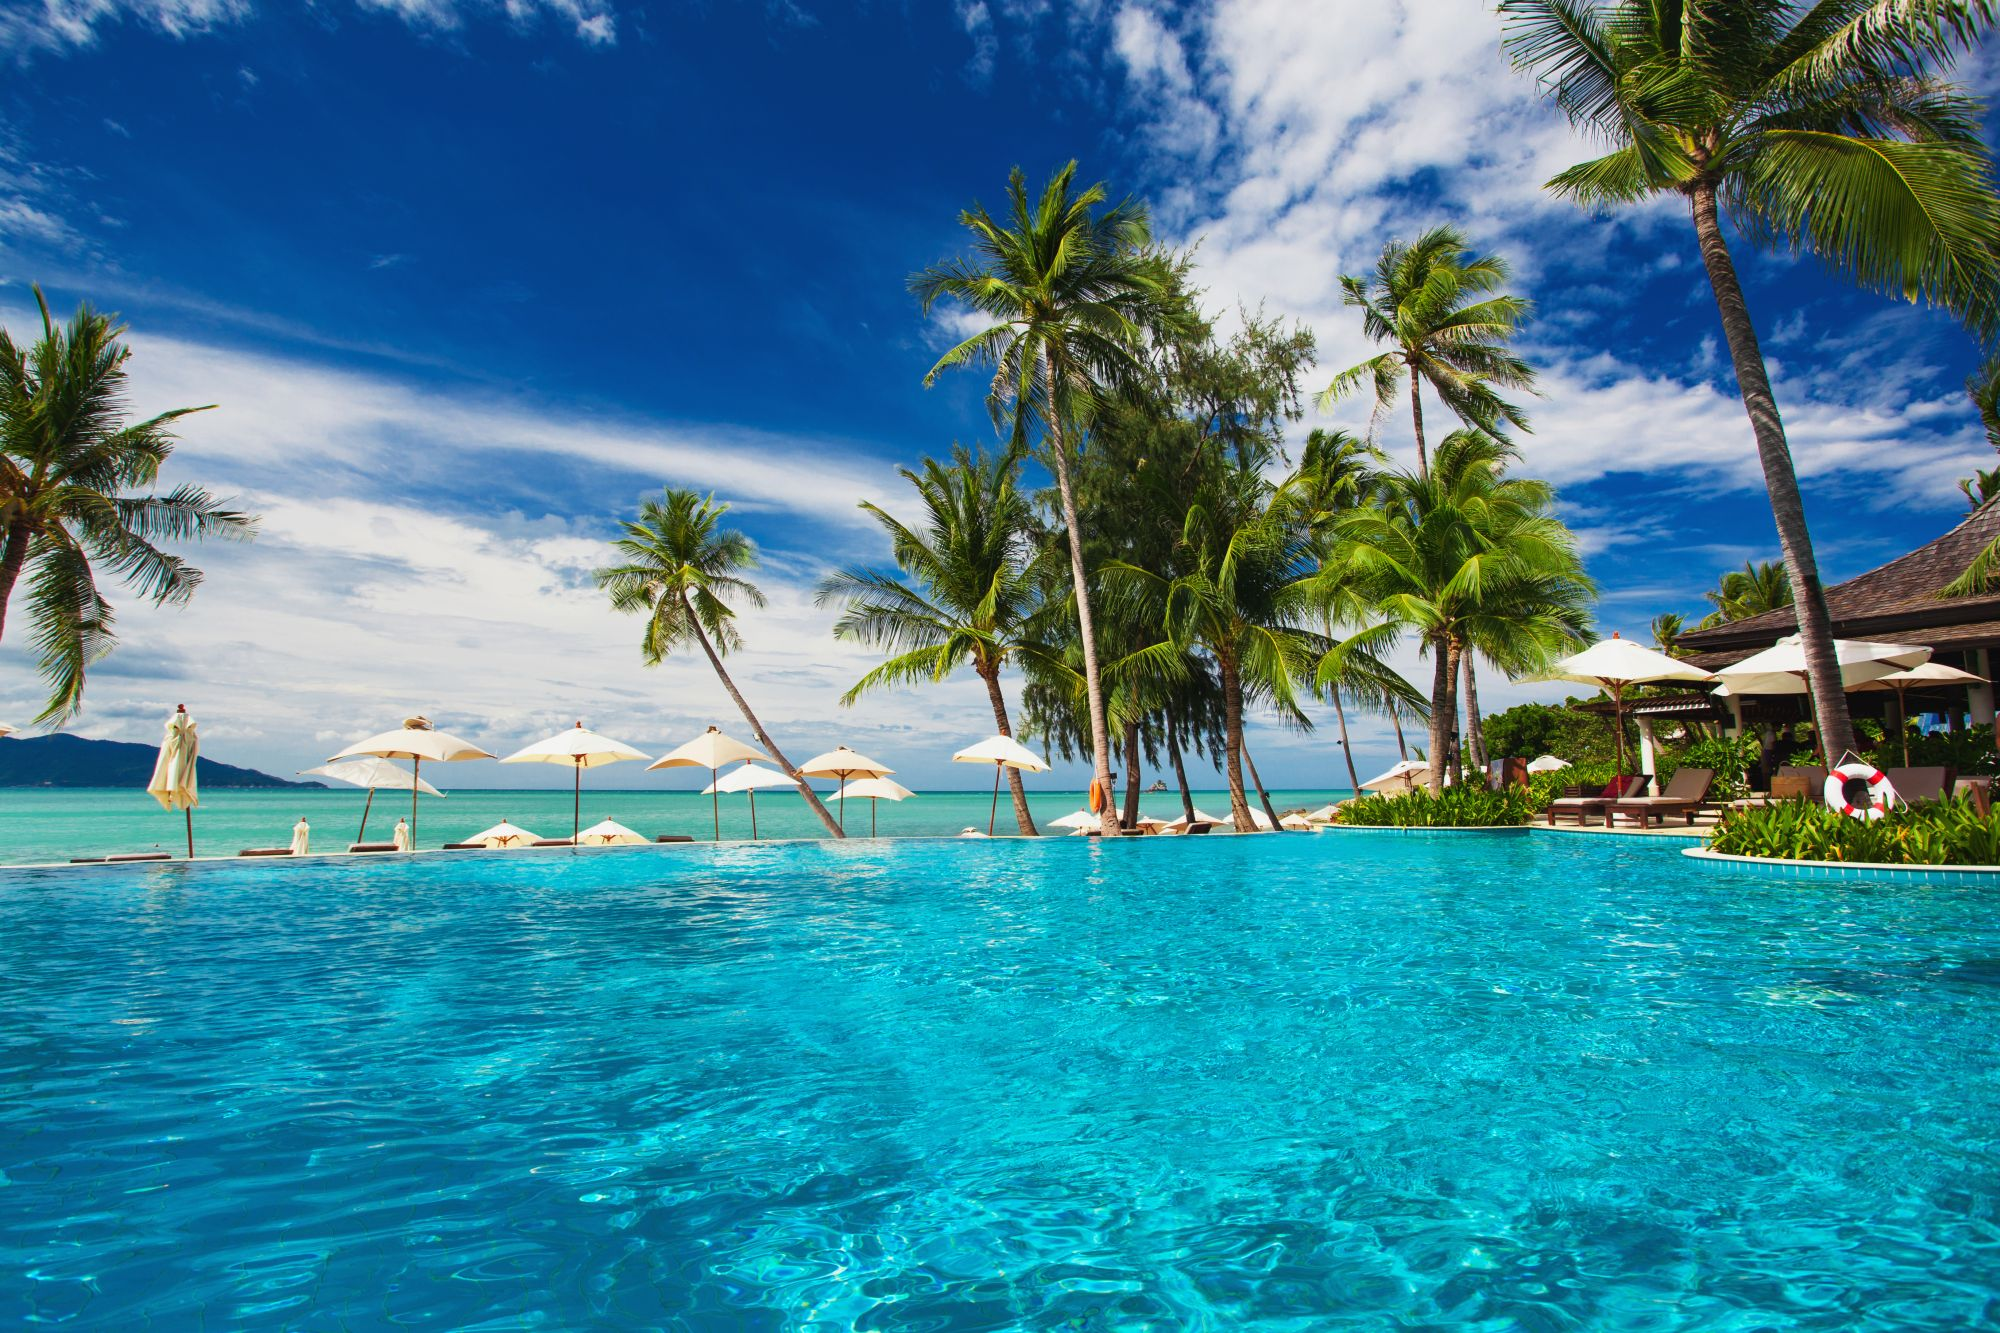 Palmy nad basenem